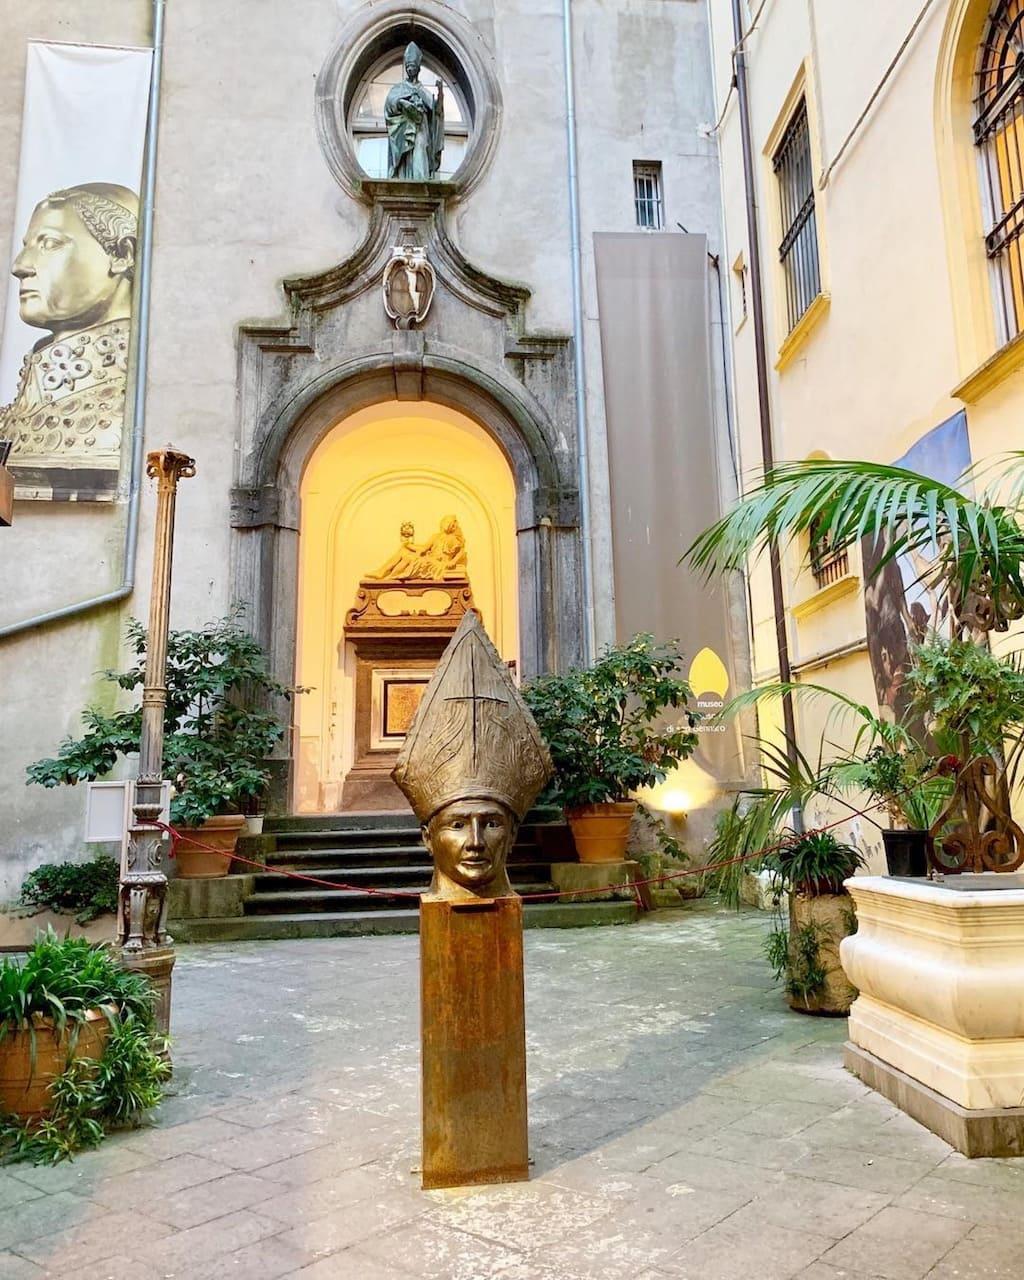 Museo del Tesoro di San Gennaro 1